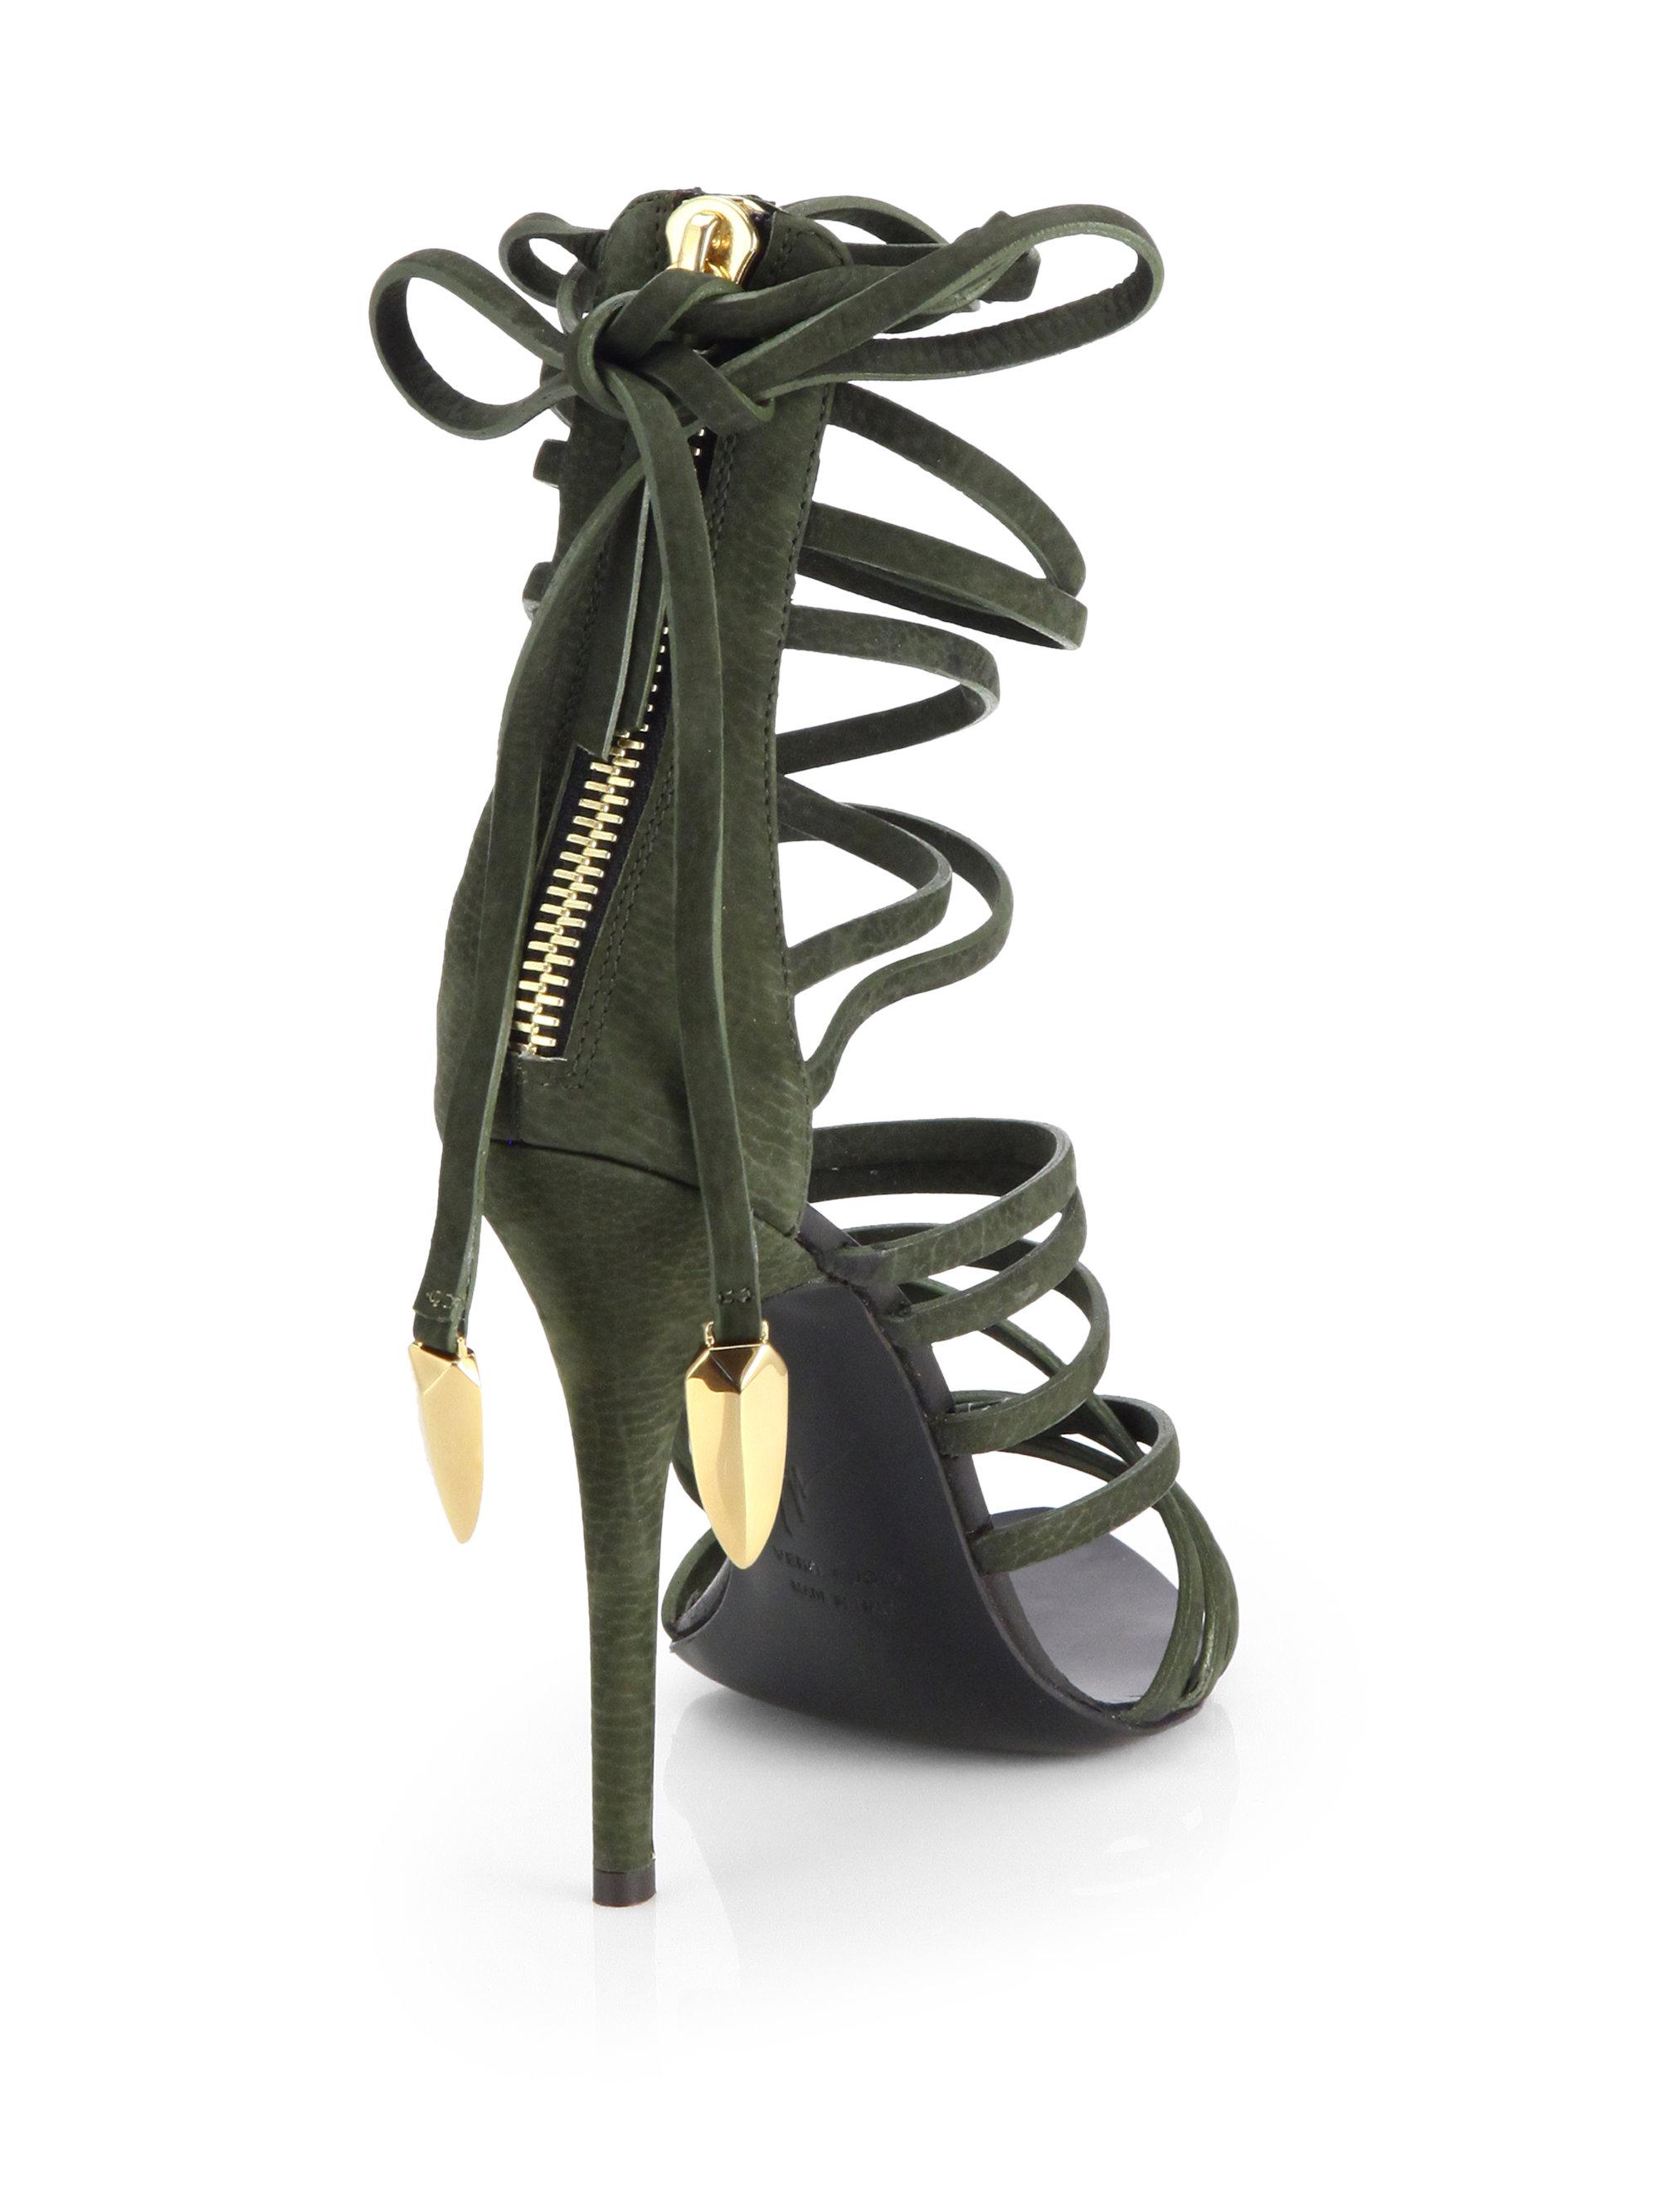 Lyst - Giuseppe Zanott... Ivanka Trump Shoes Nordstrom